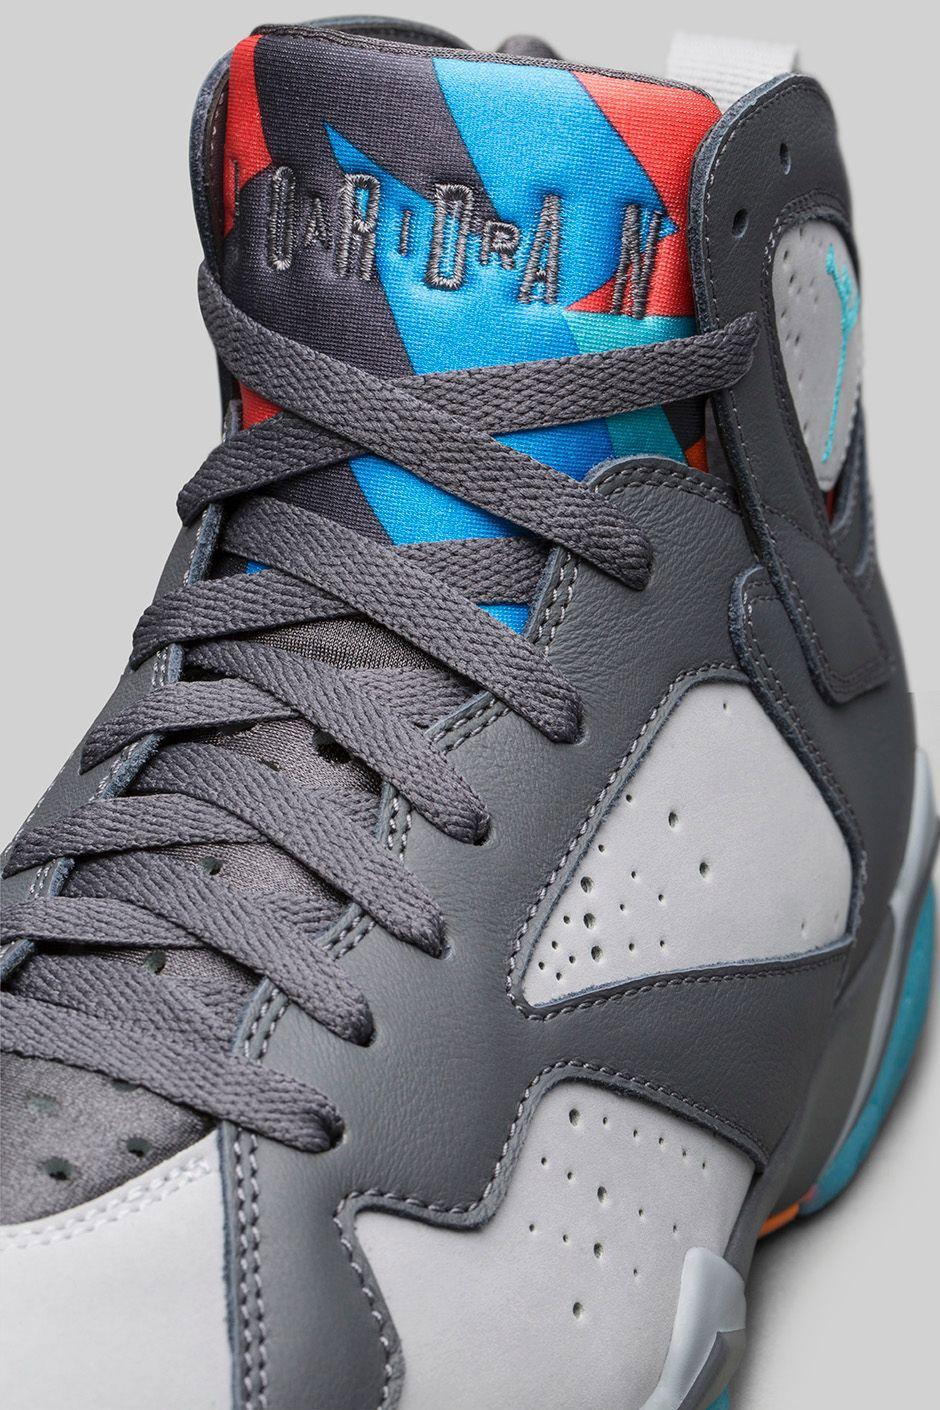 A Tribute To Barcelona And Michael Jordan S 1992 Dream Team Summer Sneakernews Com Air Jordans Nike Shoes Women Adidas Shoes Outlet